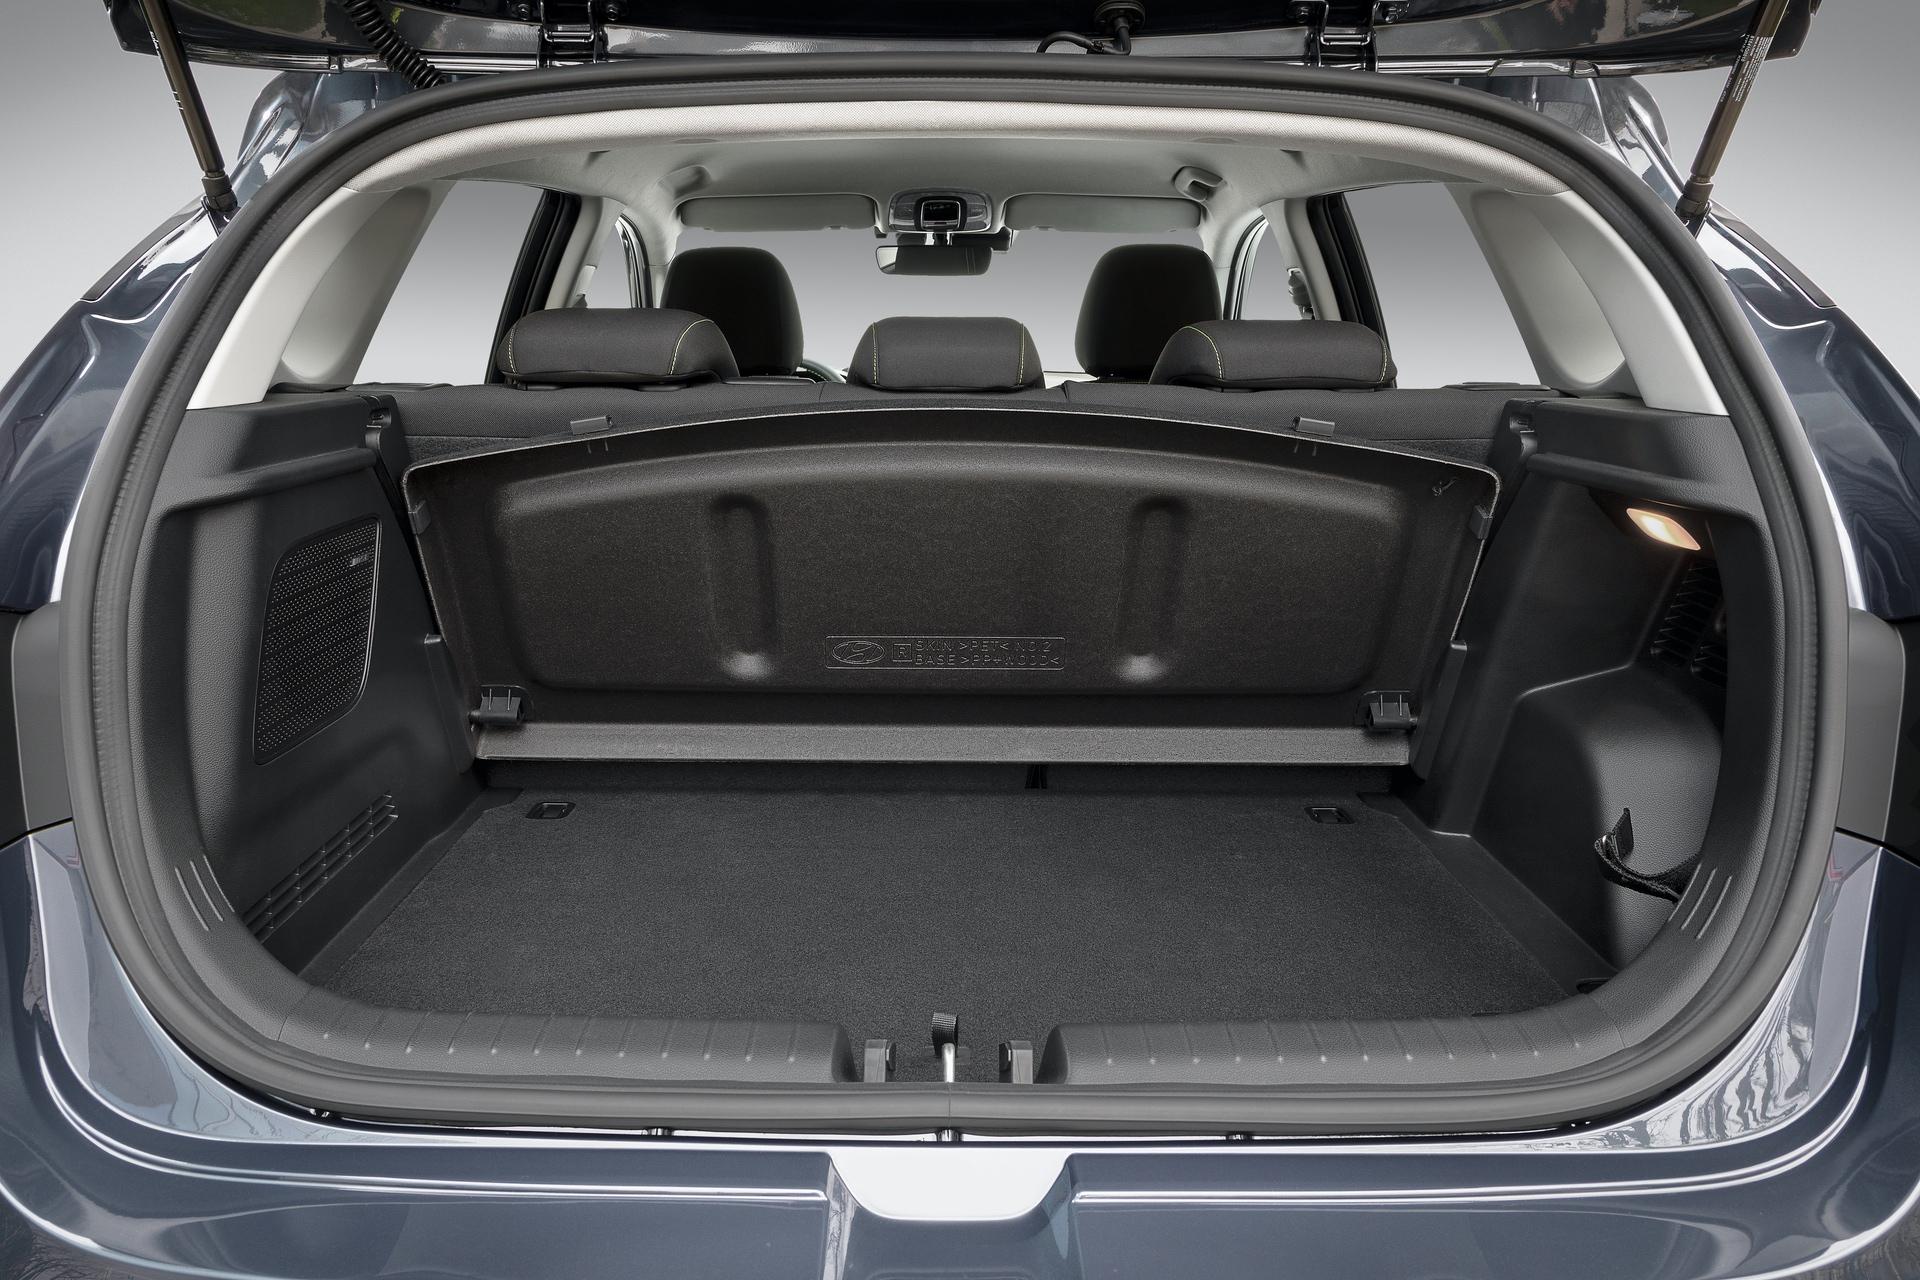 Hyundai_i20_interior_0008